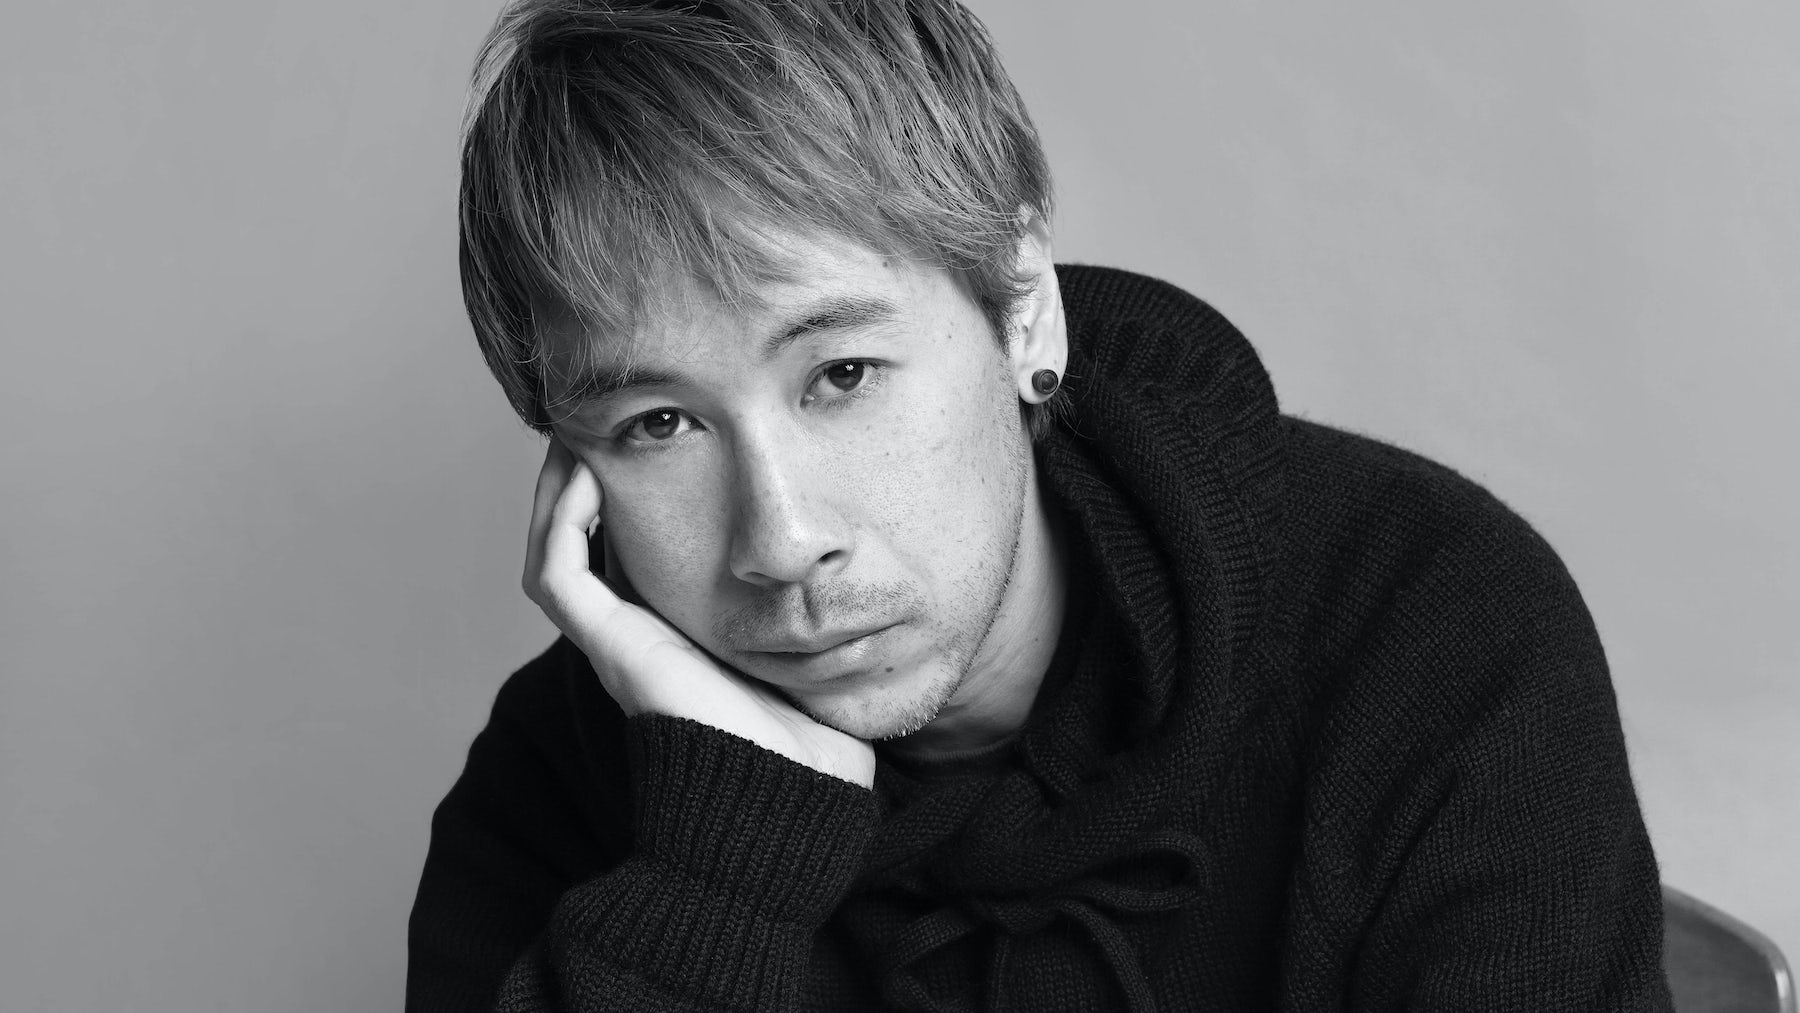 Jun Takahashi, designer and founder of Undercover | Photo: Yoshie Tominaga